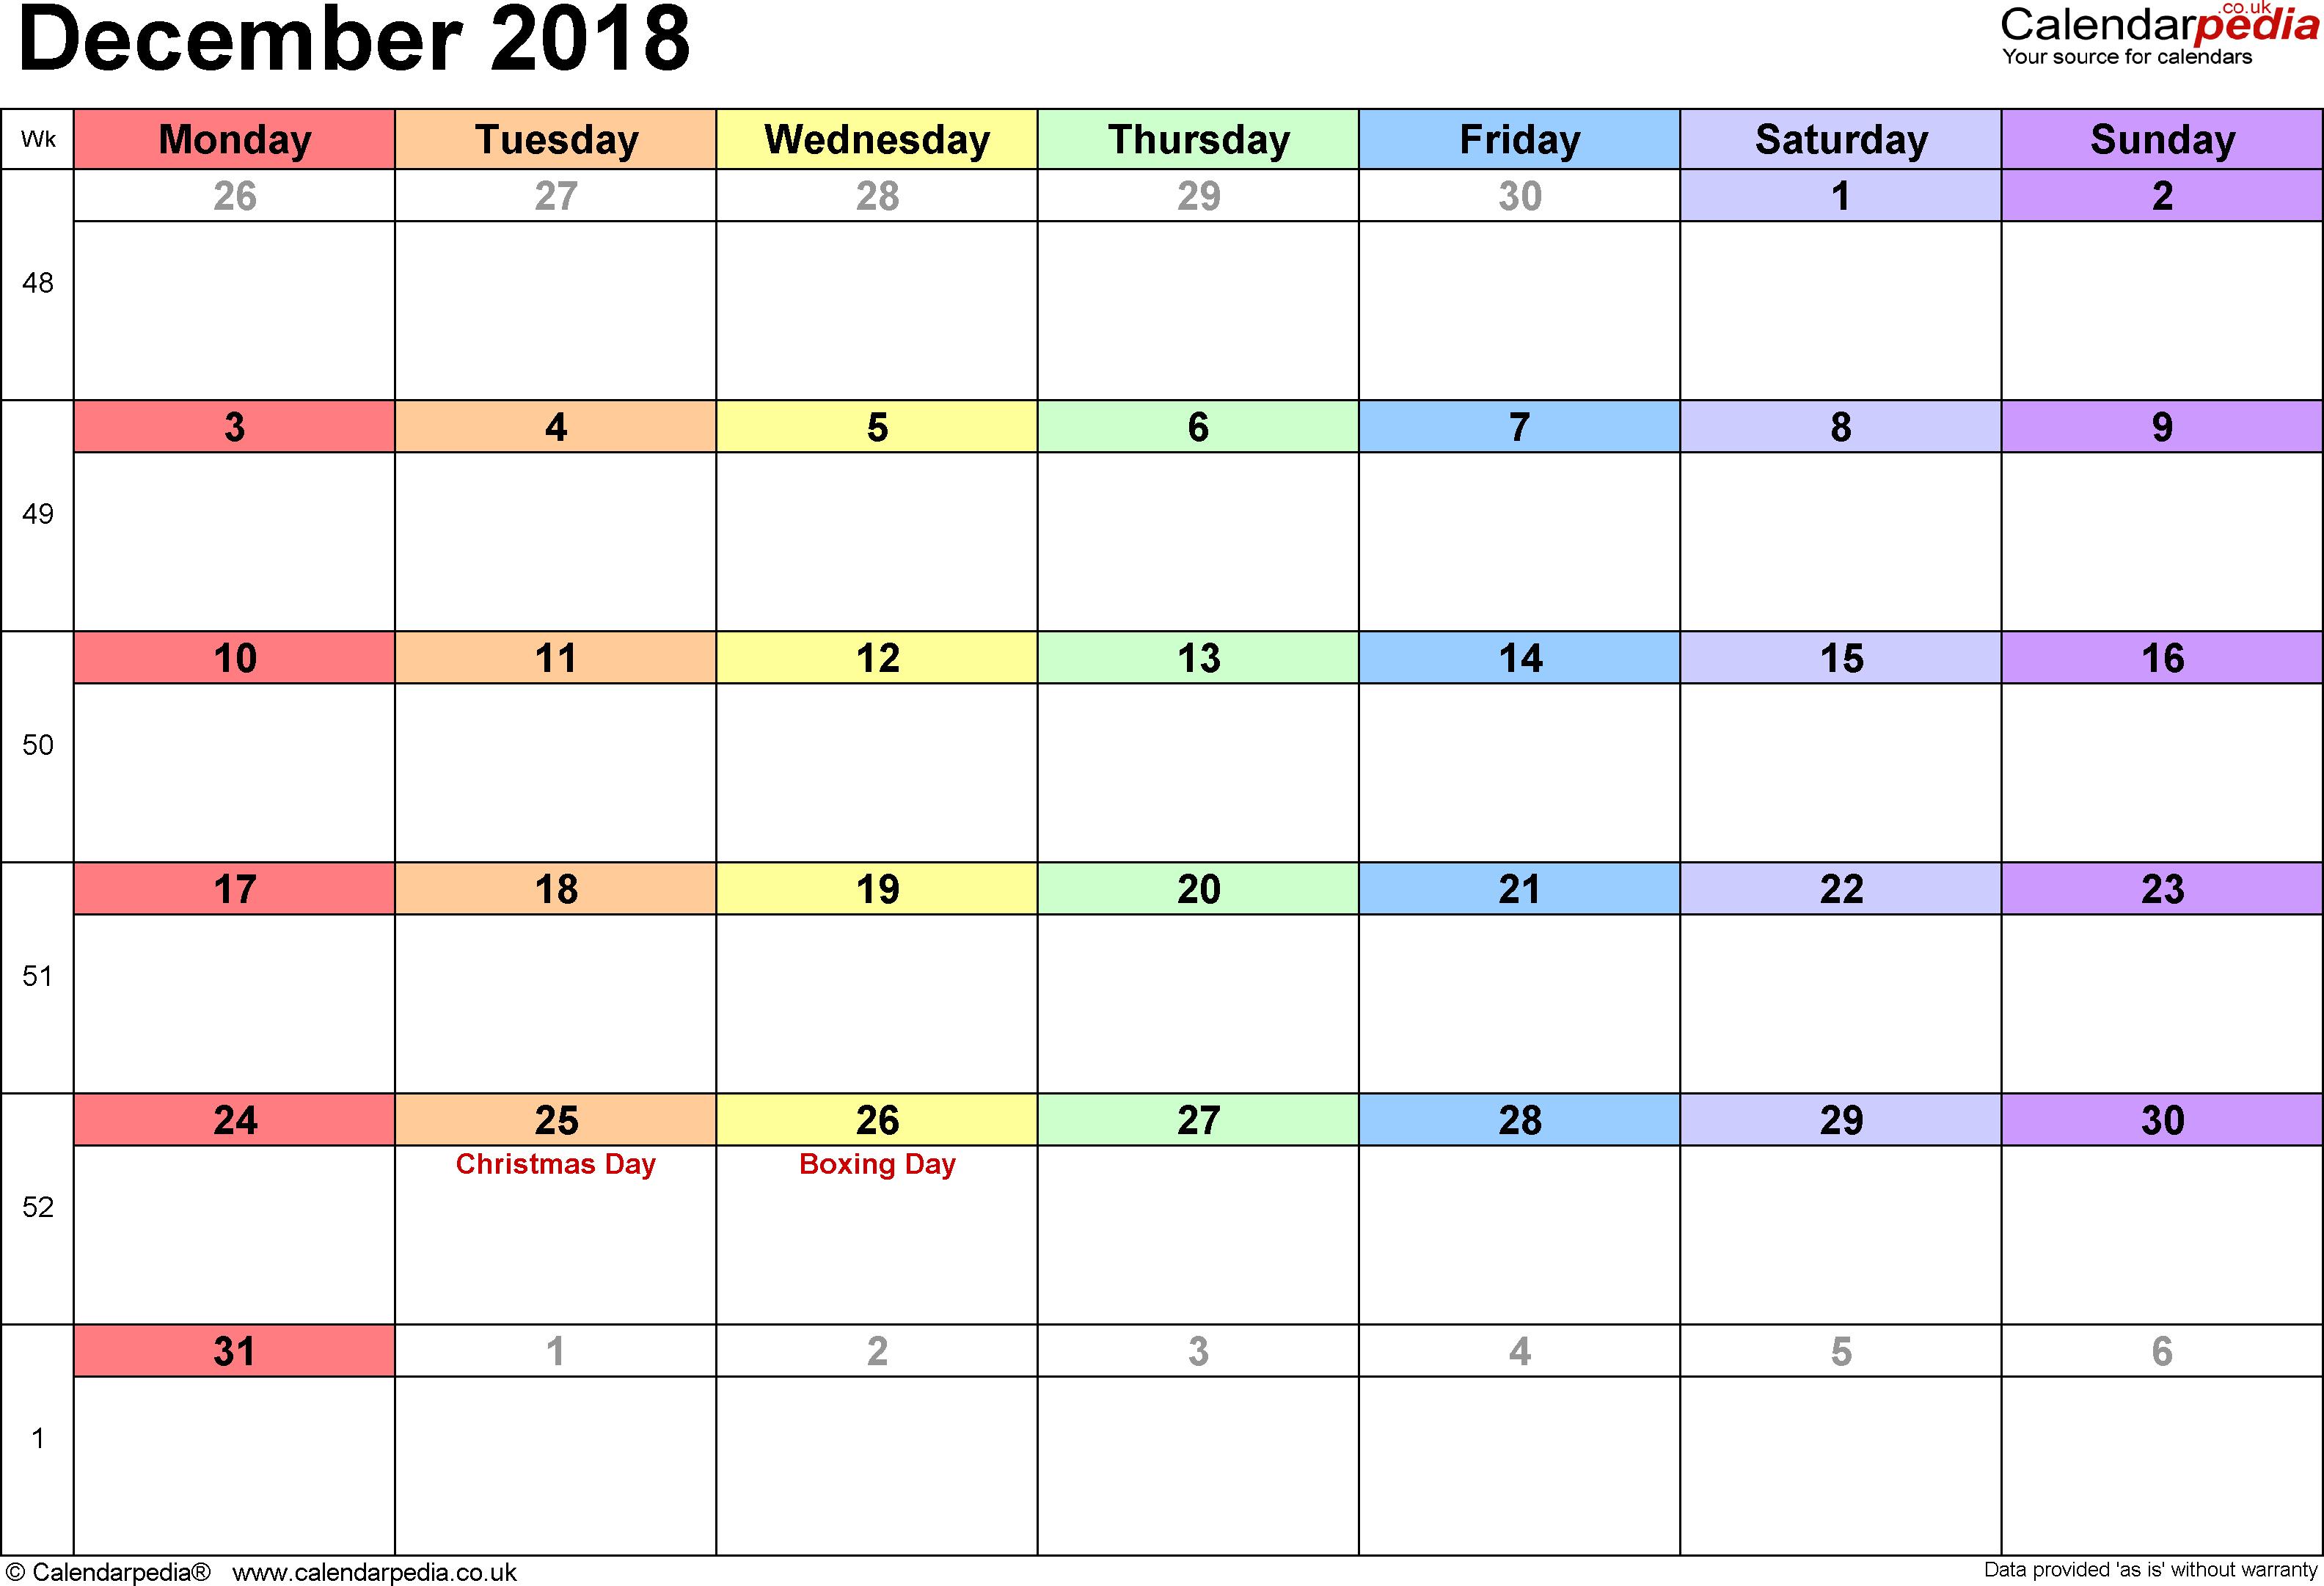 Calendar December 2018 Uk, Bank Holidays, Excel/pdf/word Templates in Calendar Planner Template Excel December